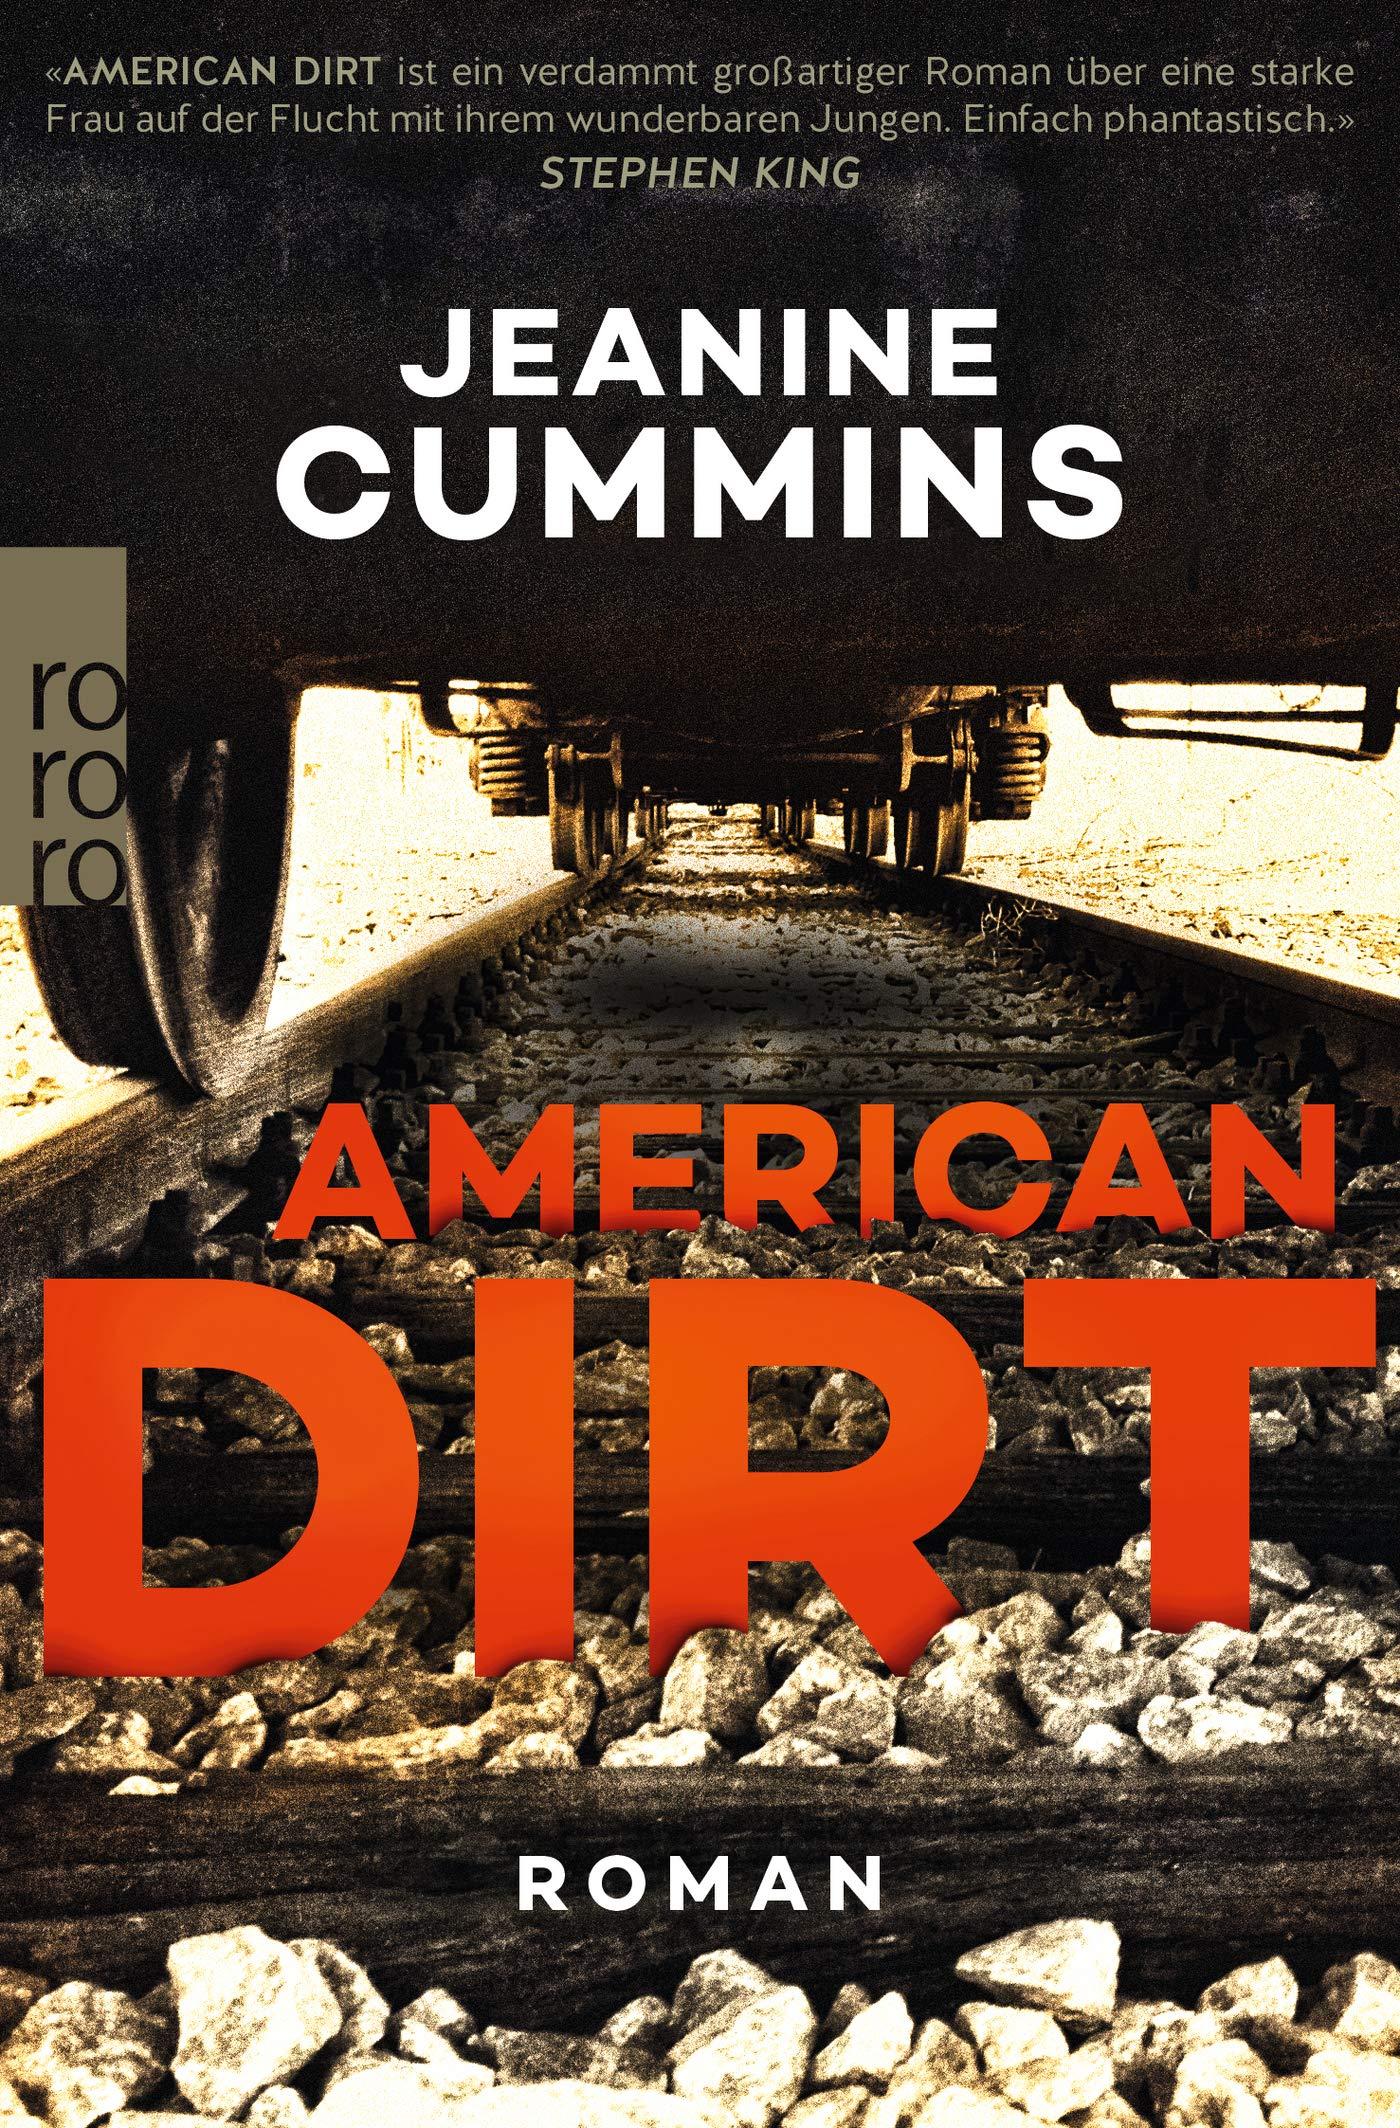 buchcover american dirt